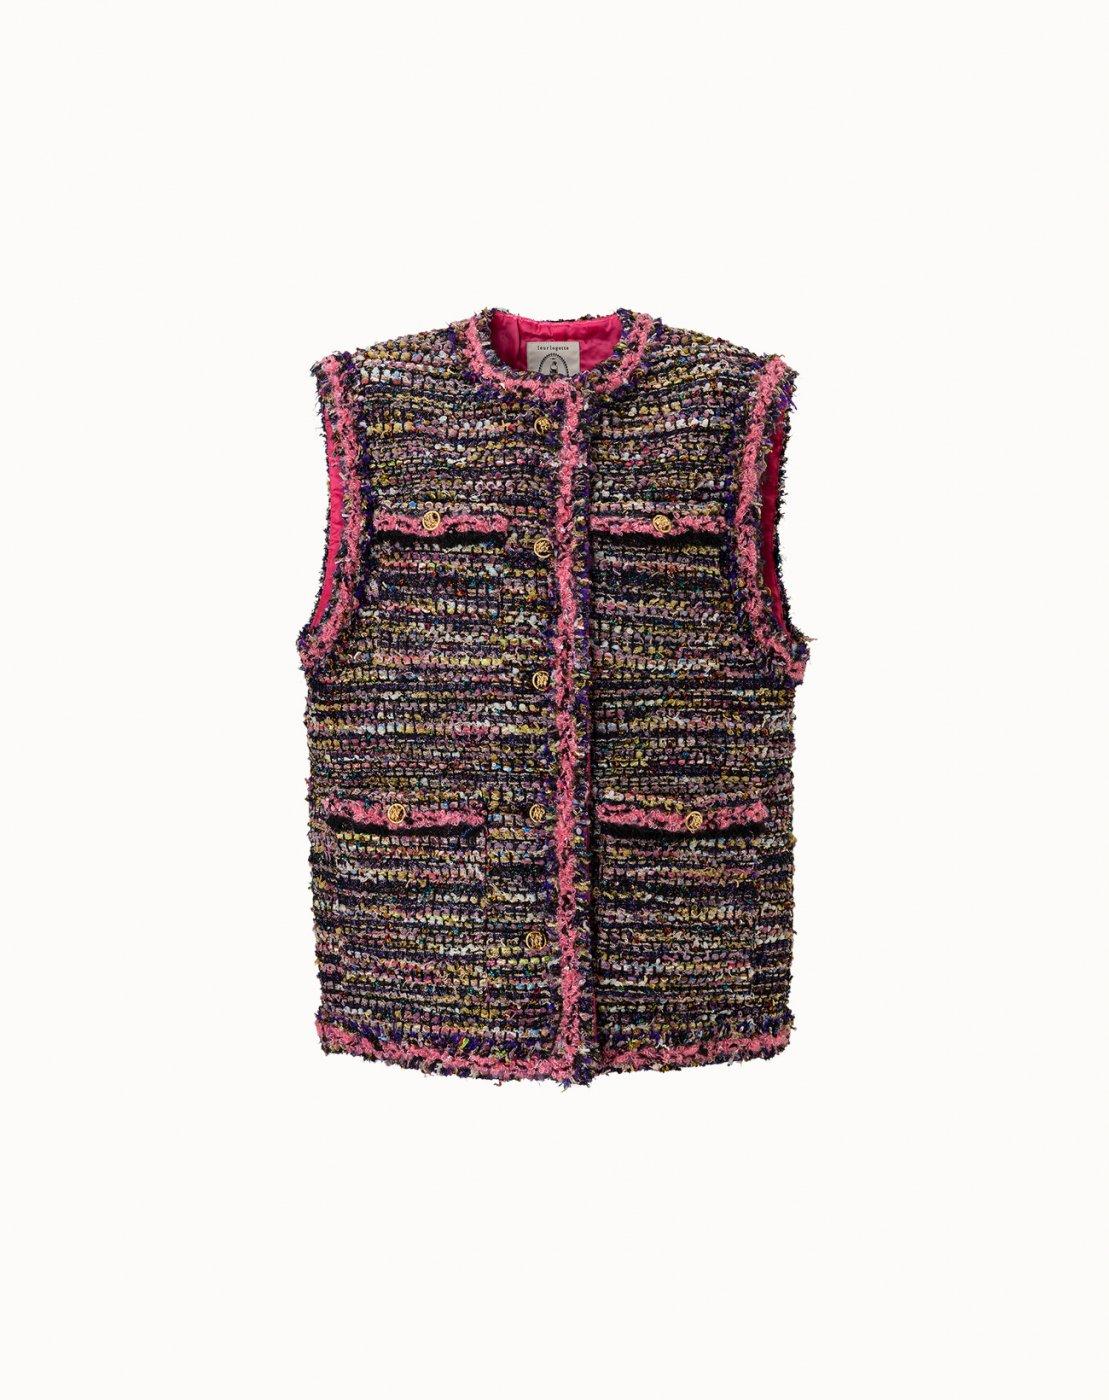 leur logette - <img class='new_mark_img1' src='https://img.shop-pro.jp/img/new/icons47.gif' style='border:none;display:inline;margin:0px;padding:0px;width:auto;' />【Maison leur logette】Spangle Tweed Vest - Purple